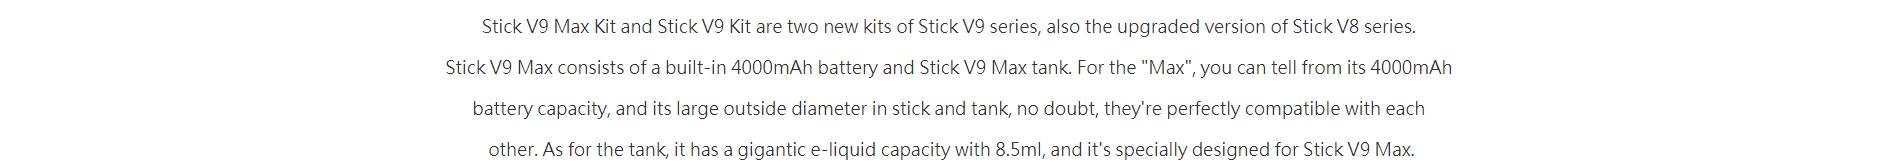 stick v9 max kit